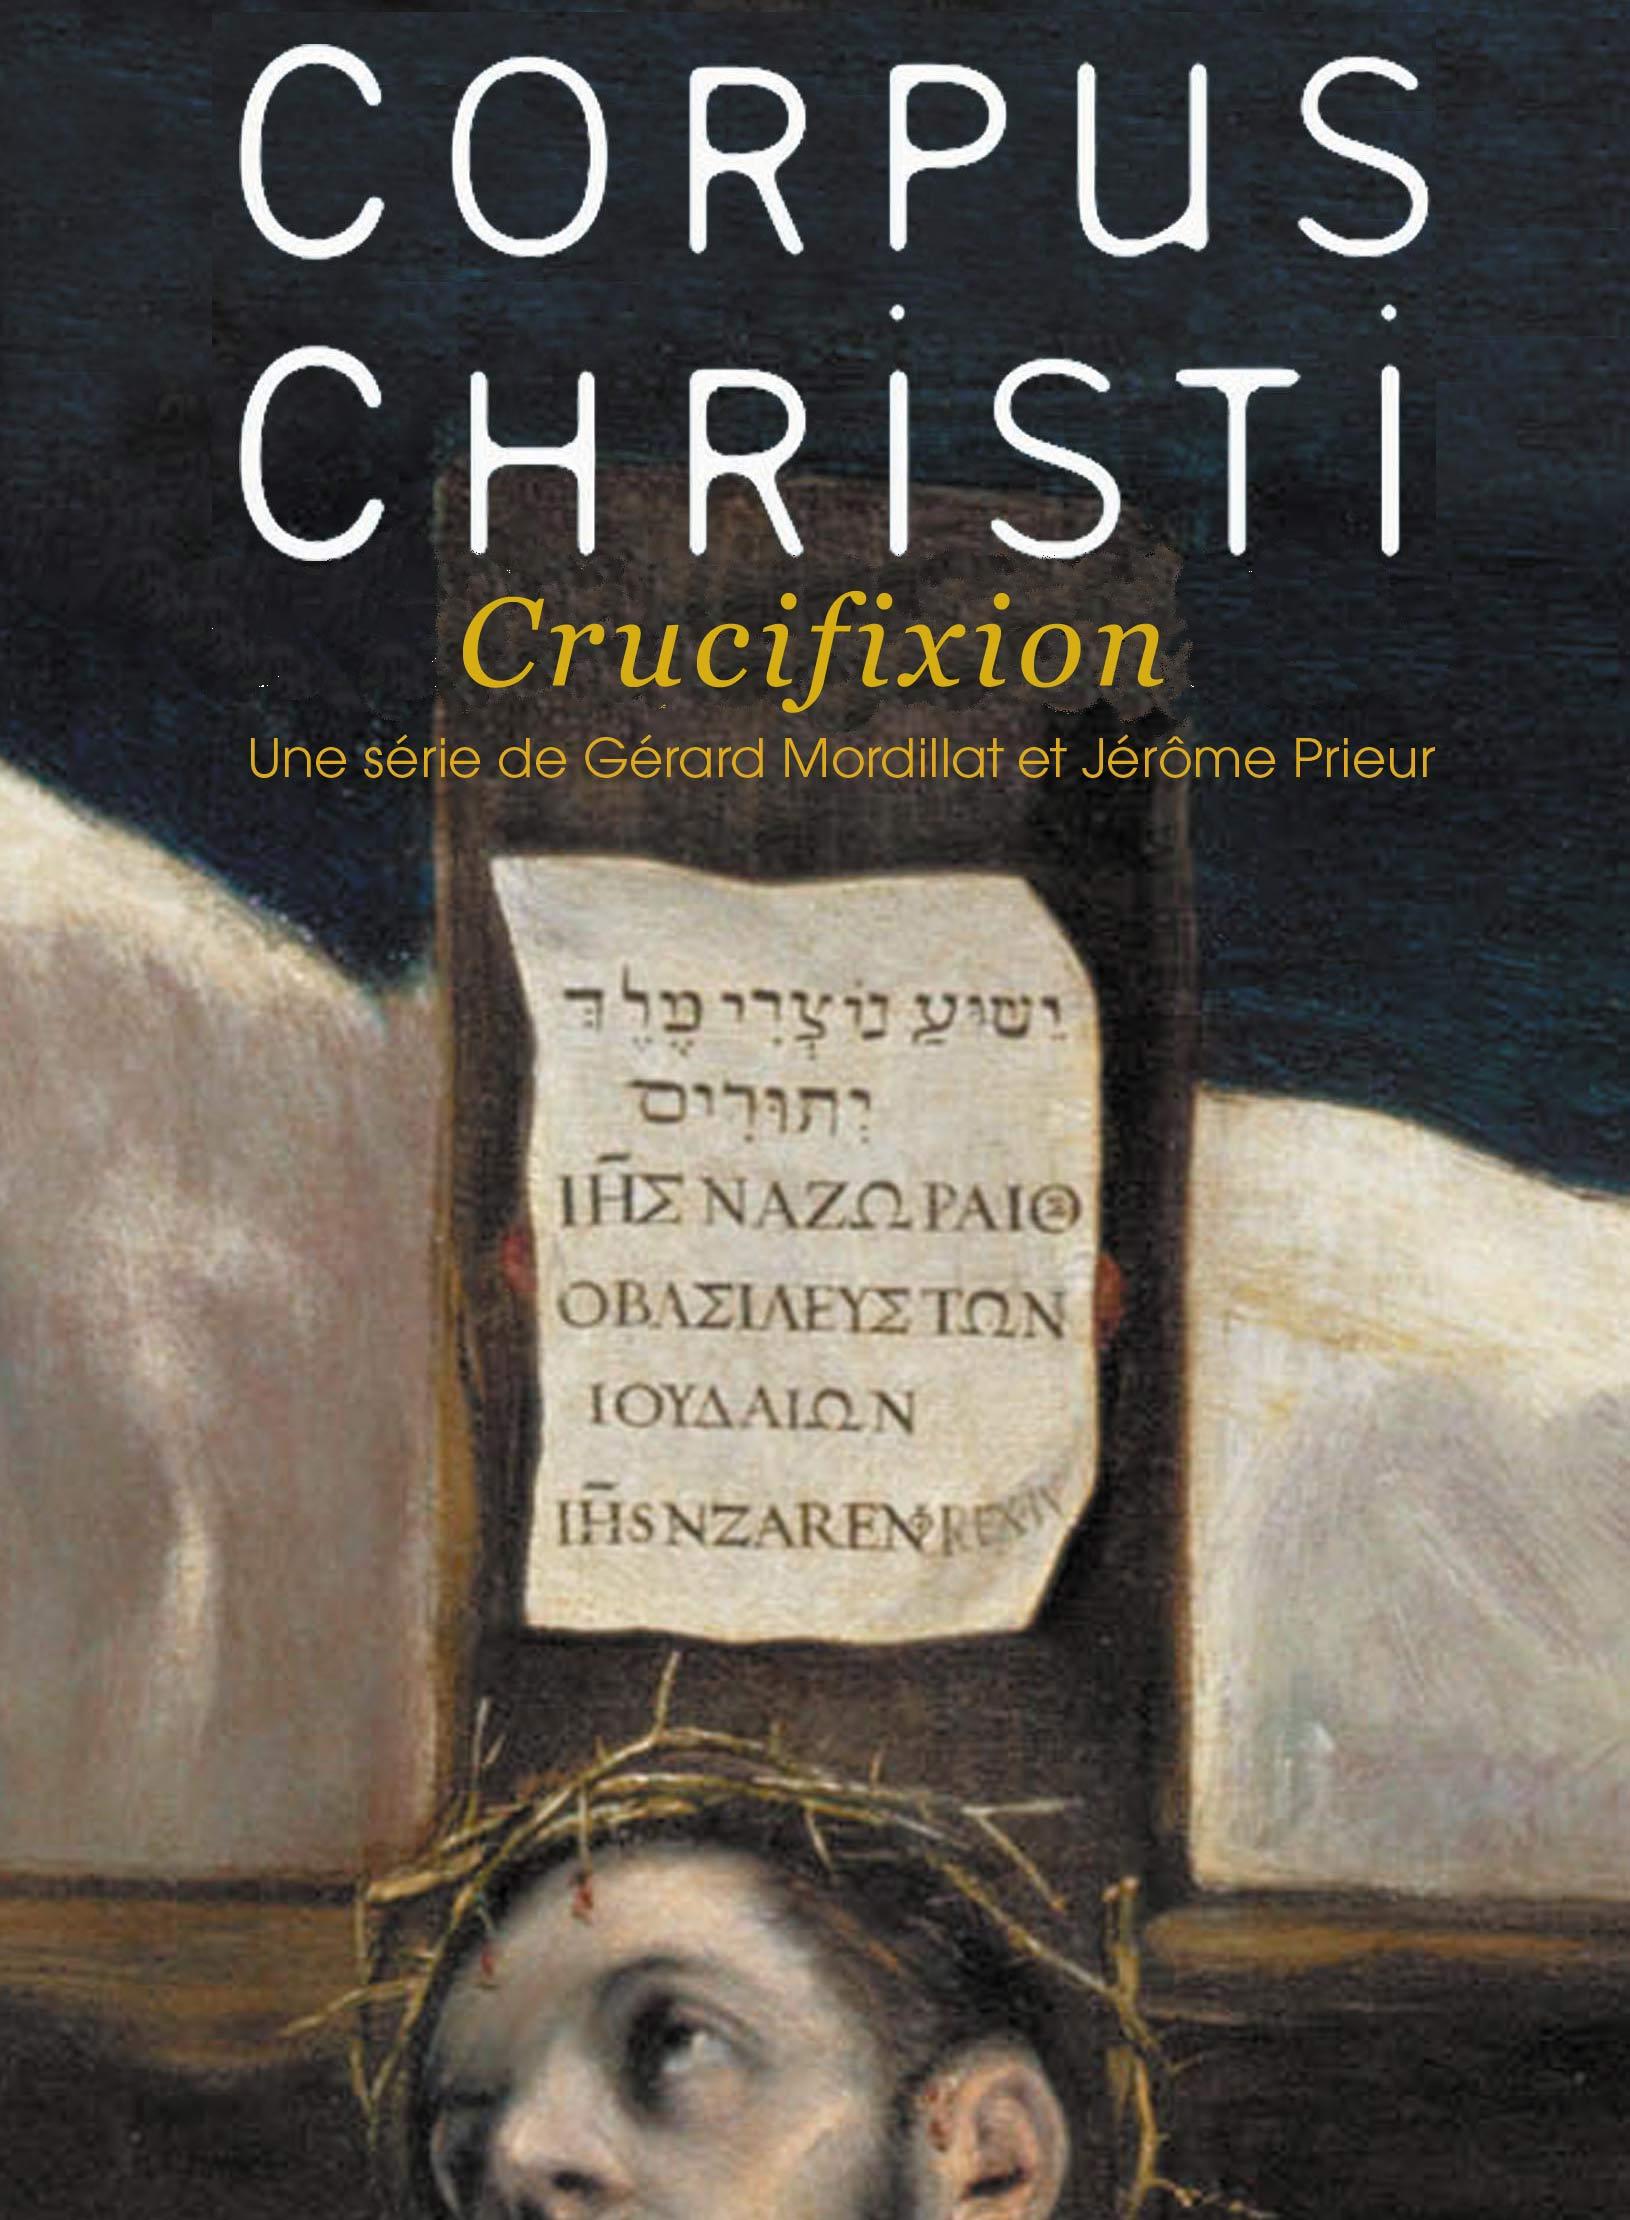 Corpus Christi - Crucifixion | Mordillat, Gérard (Réalisateur)